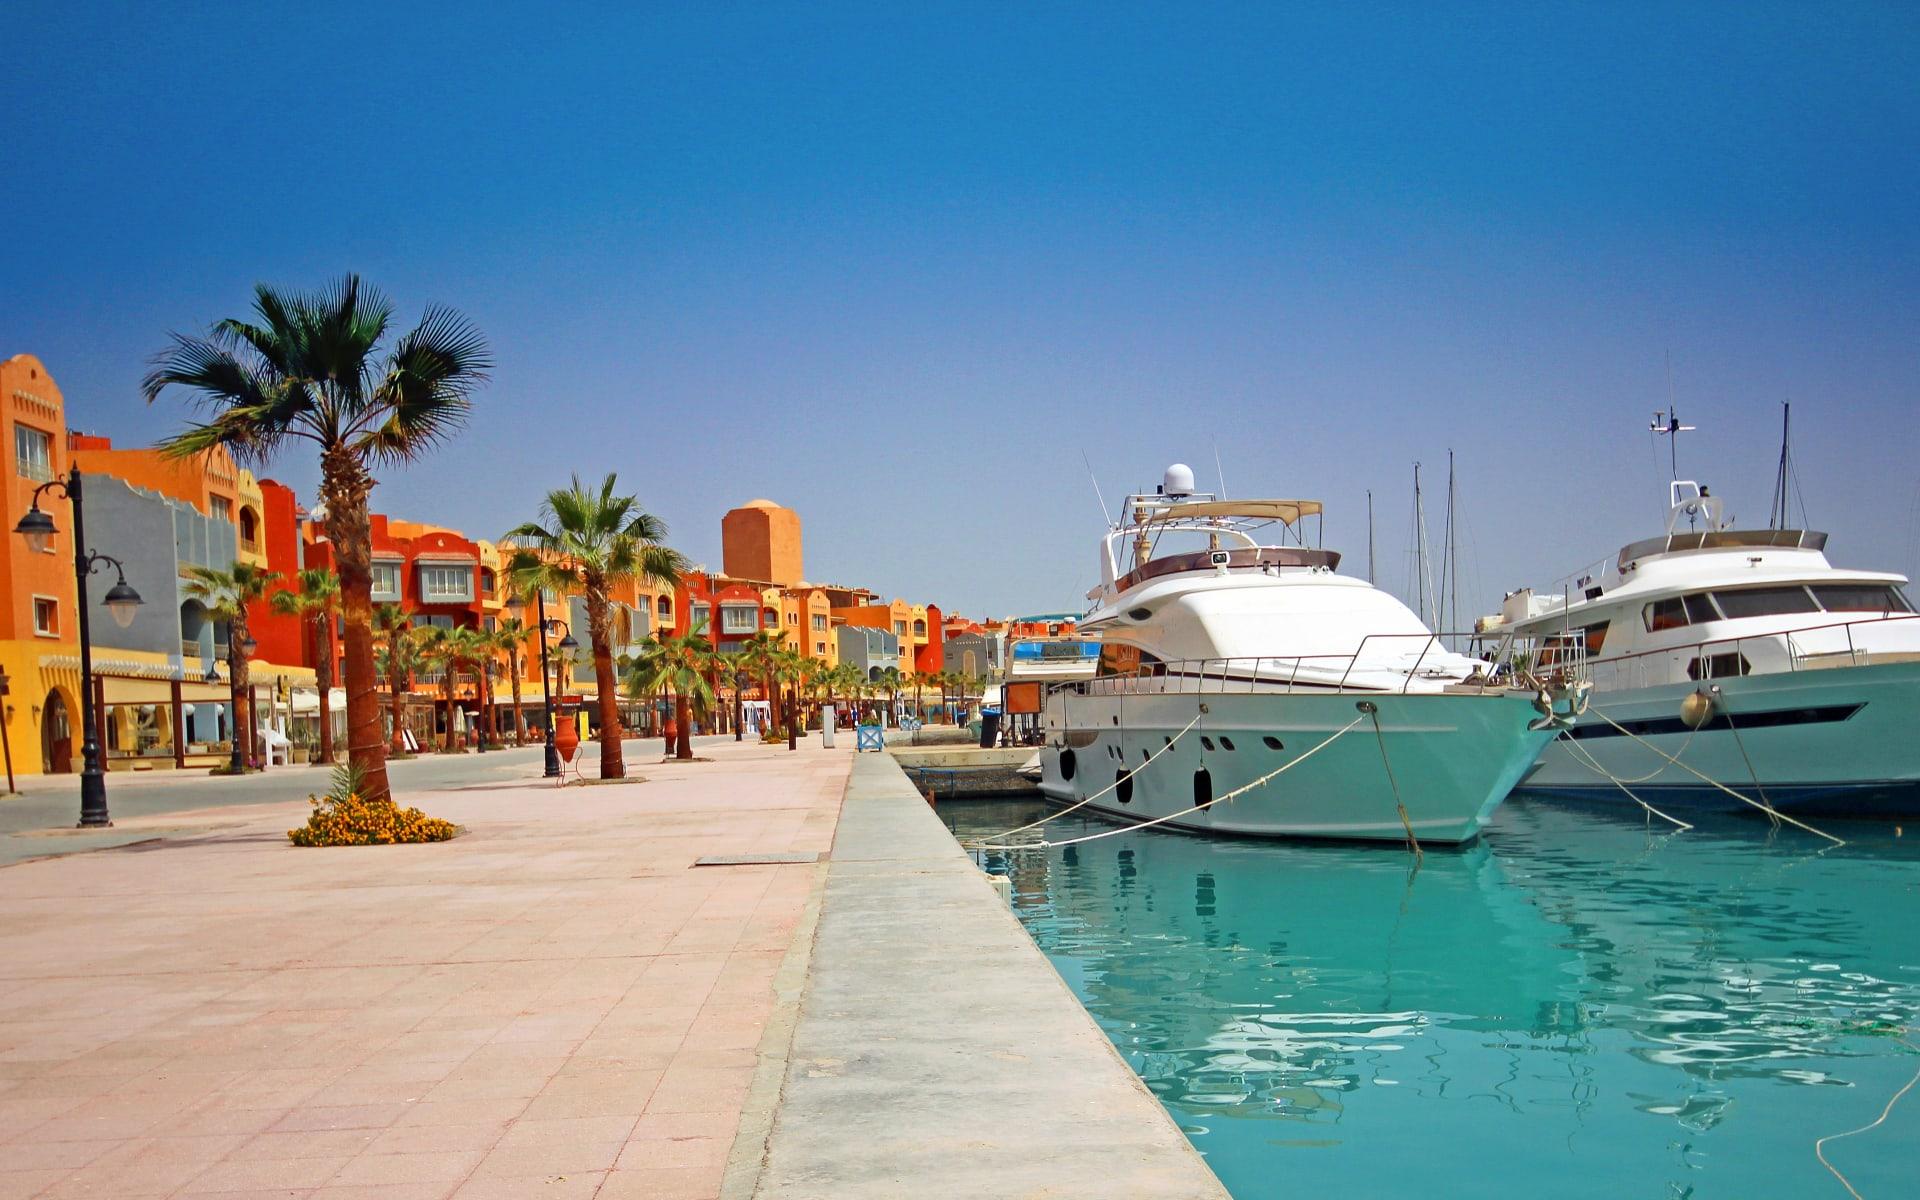 Badeferien im Dana Beach Resort ab Hurghada: Hurghada Marina